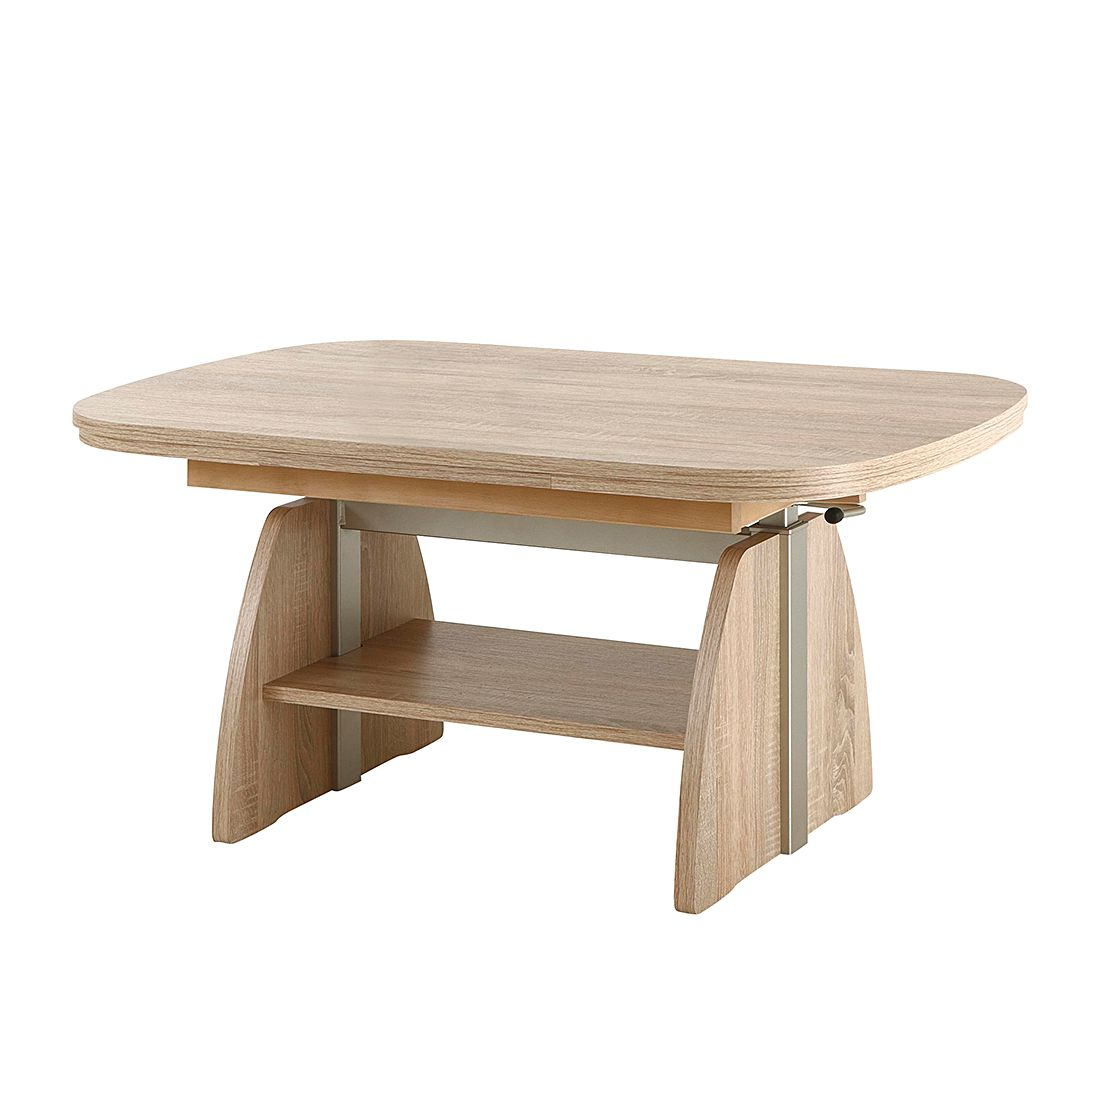 Table basse Minot (avec rallonges) - Imitation chêne Sonoma, Modoform